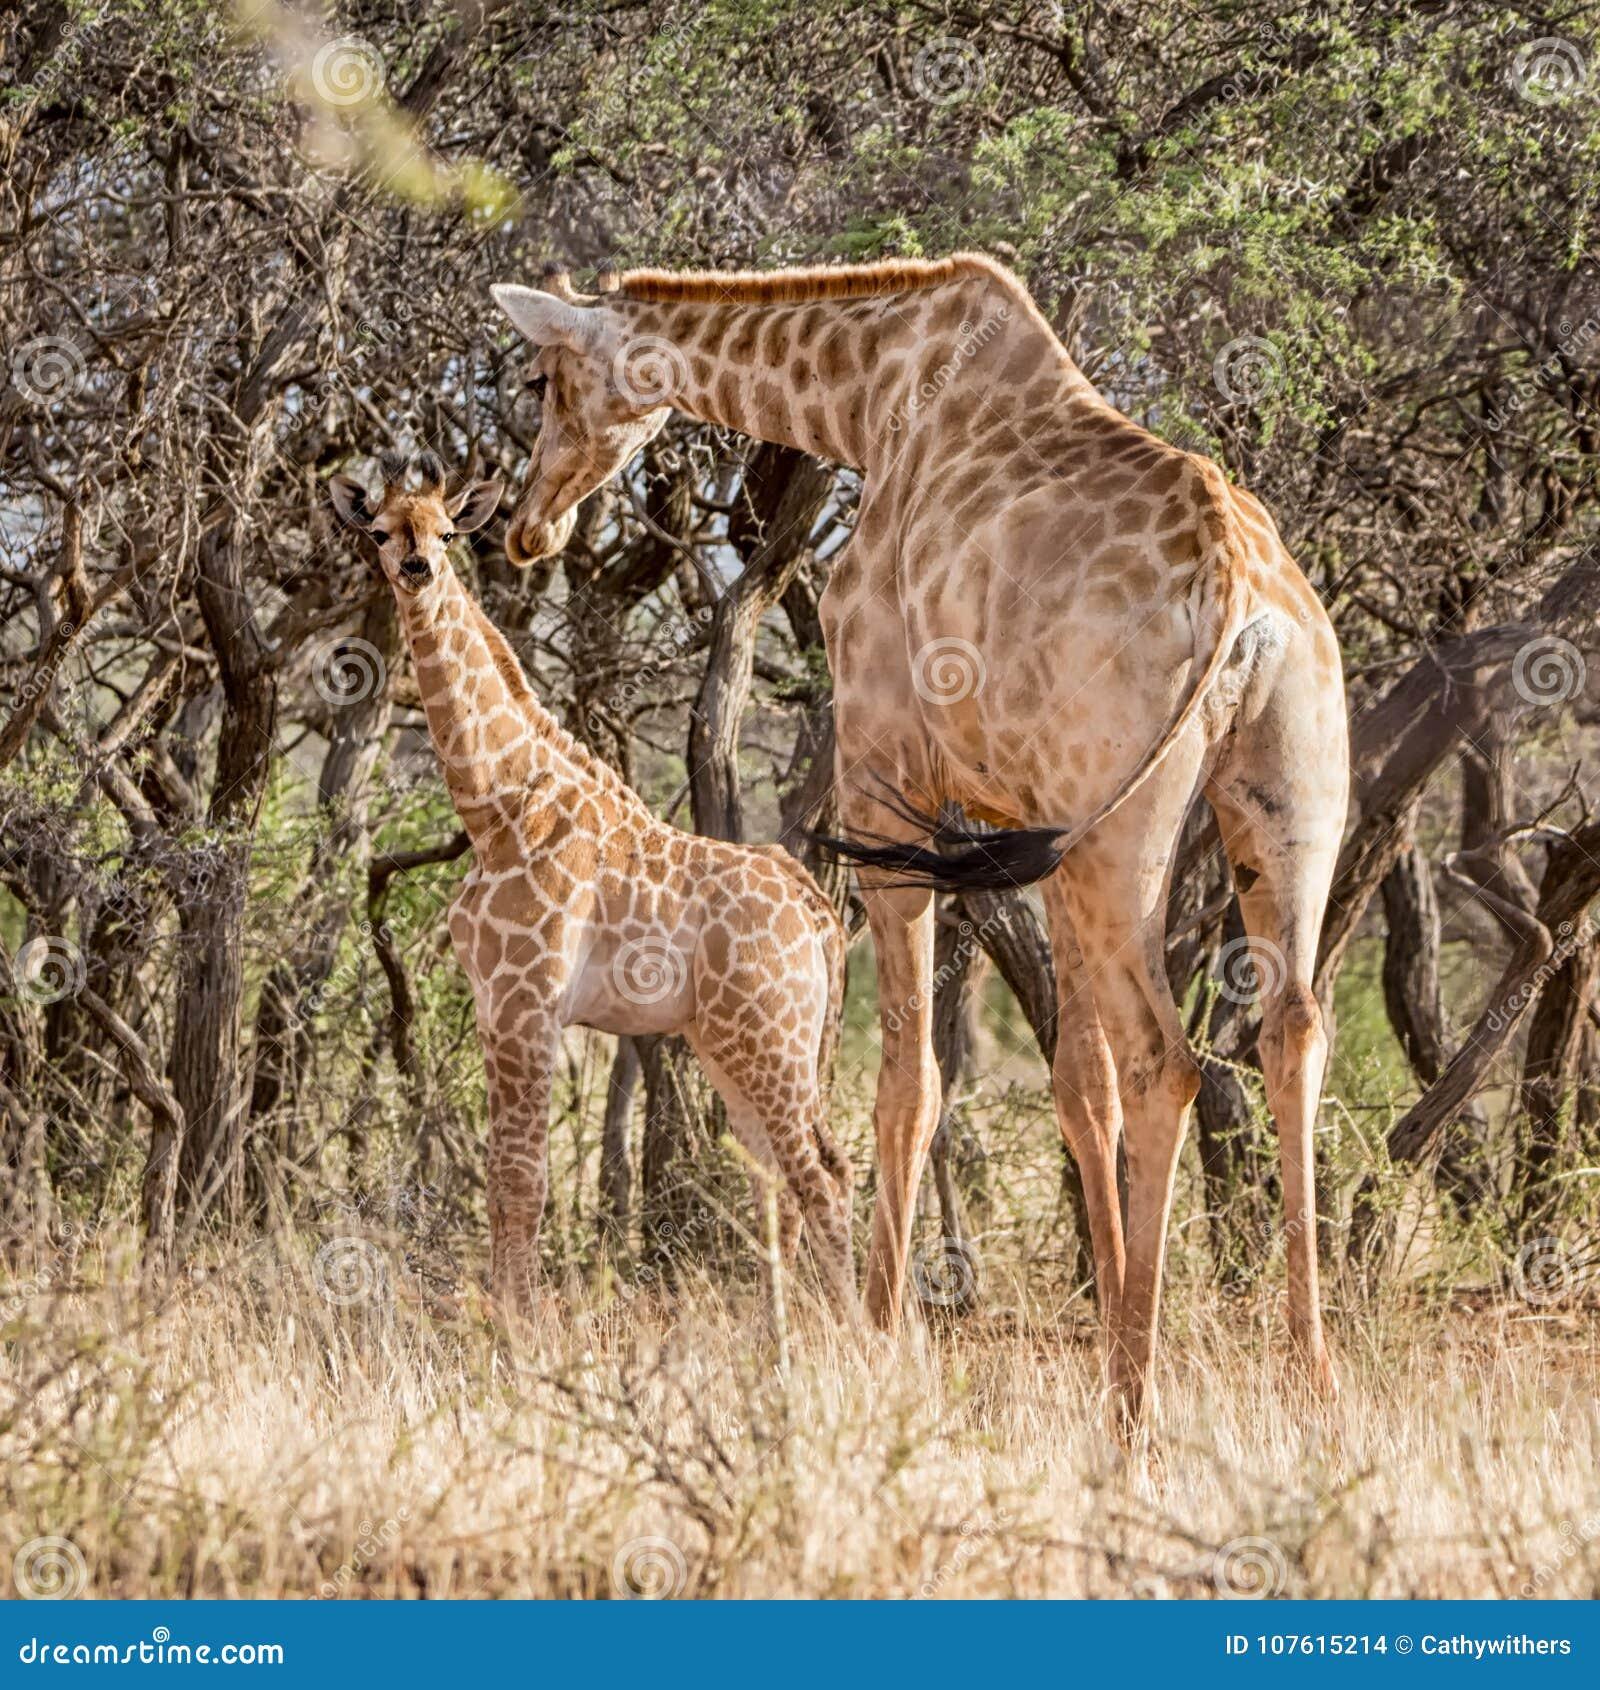 Mother And Baby Giraffe Stock Photo Image Of Cream 107615214